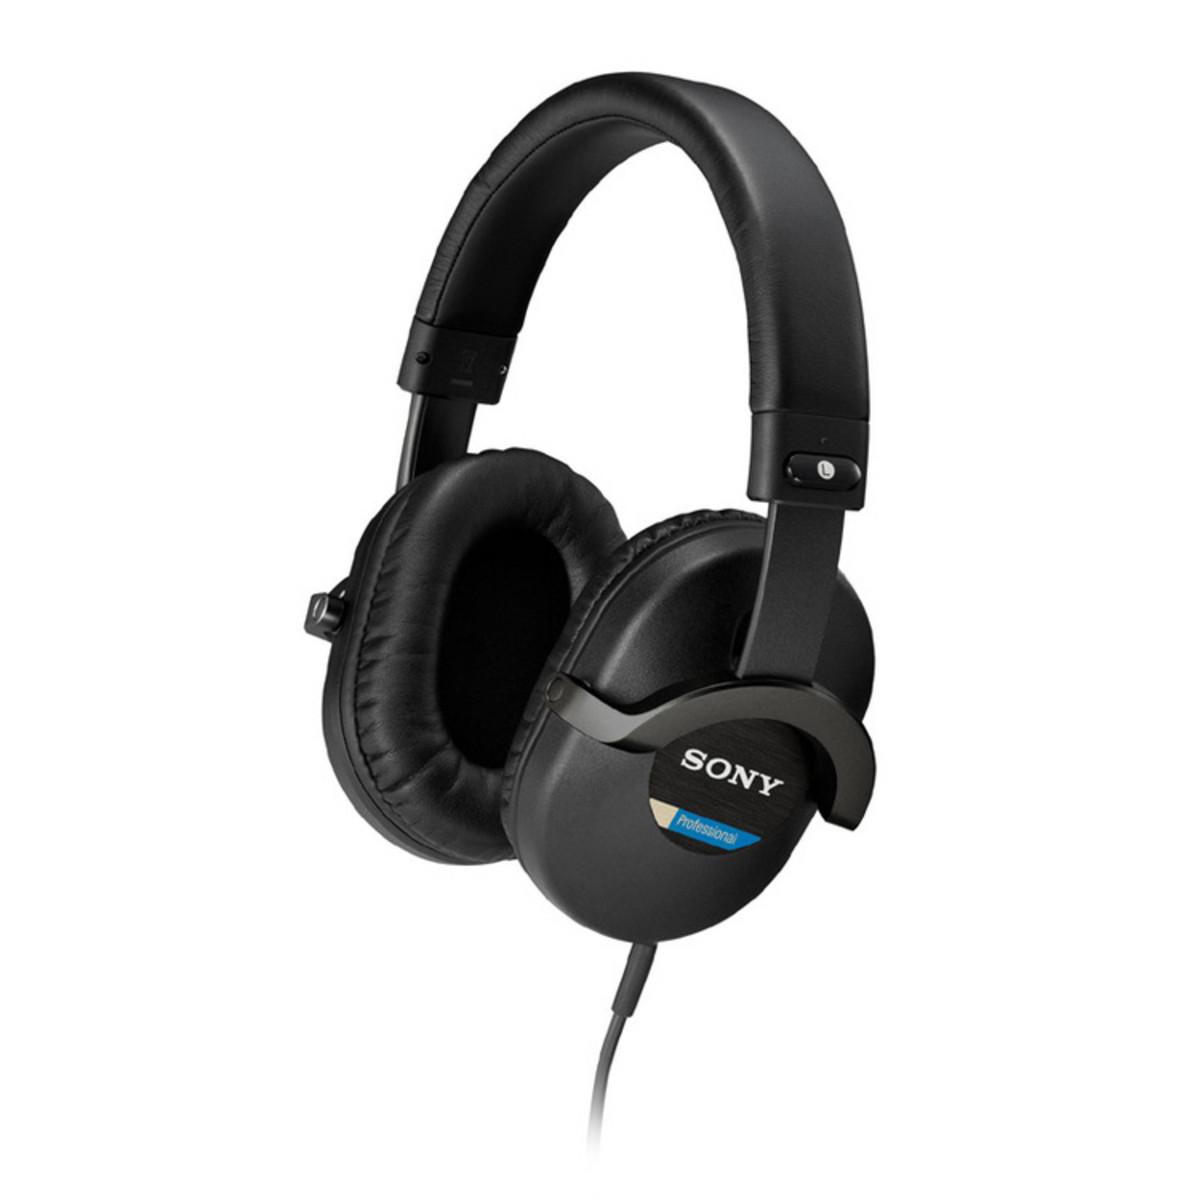 5ebf11c6b4f Sony MDR-7510 Professional Studio Monitor Headphones. Loading zoom